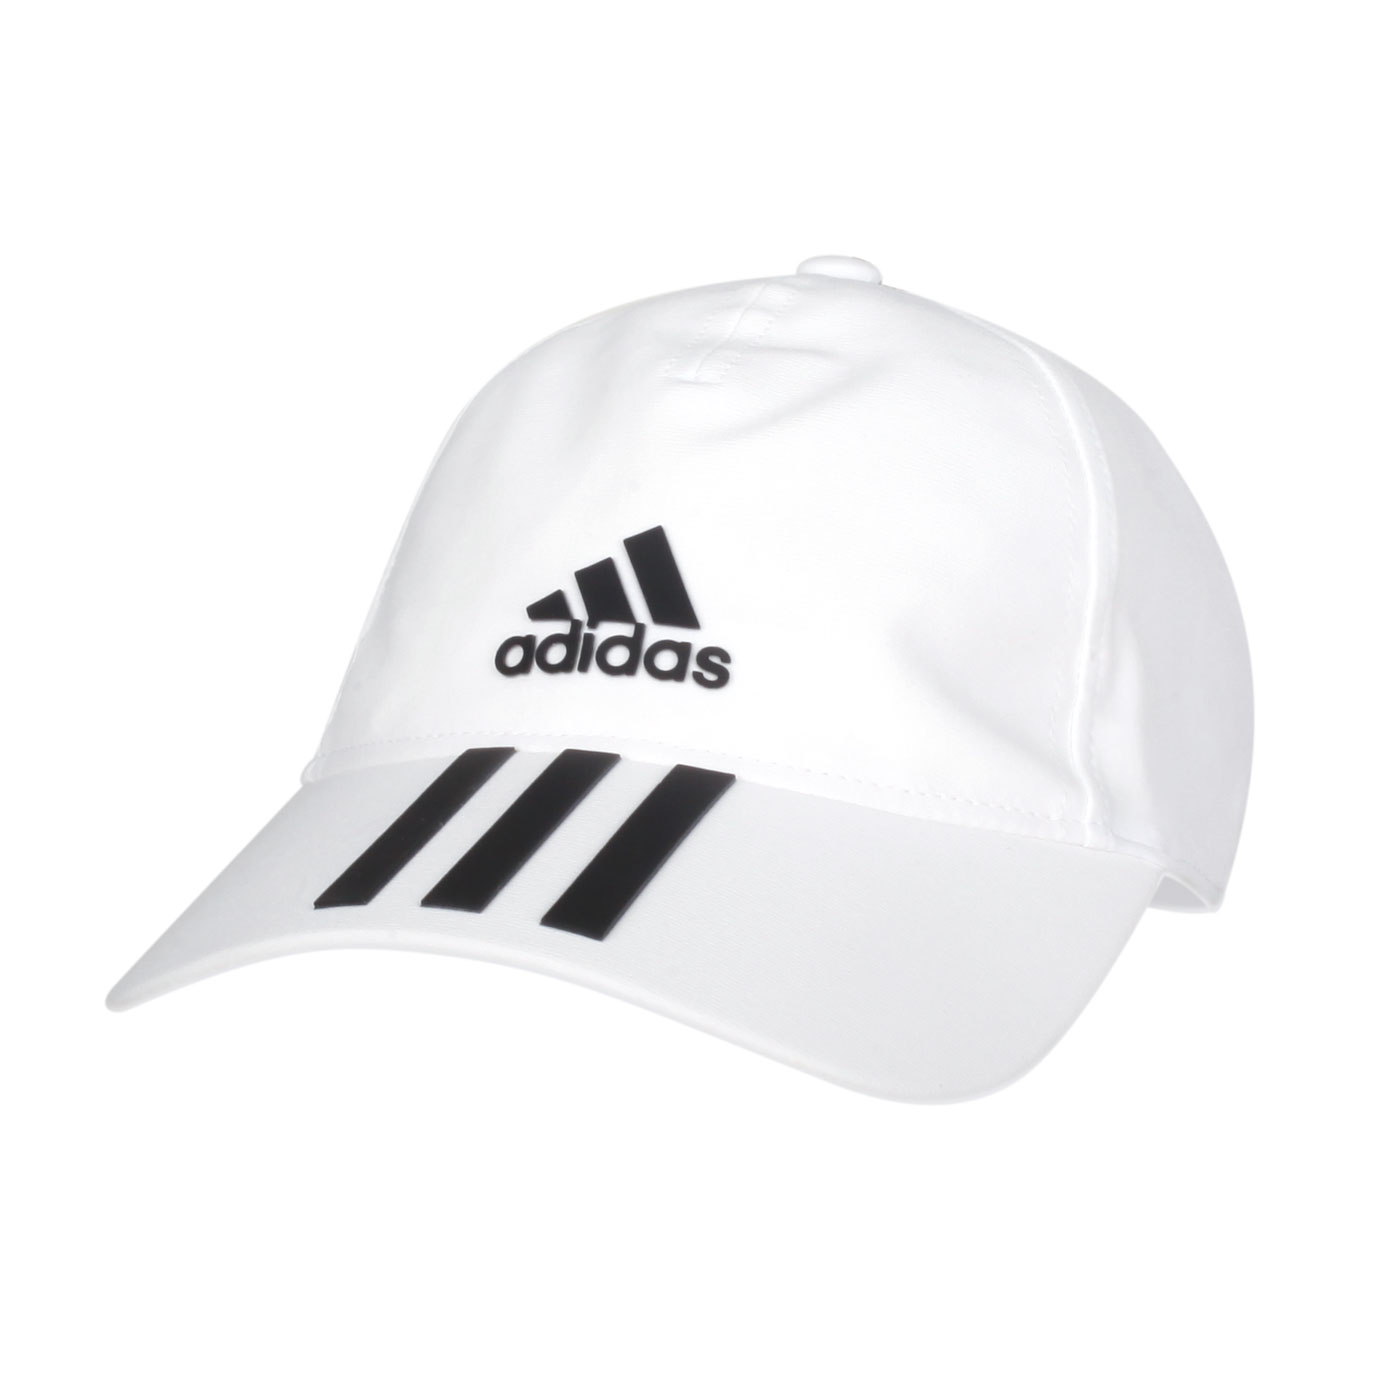 ADIDAS 帽子 GM4511 - 白黑